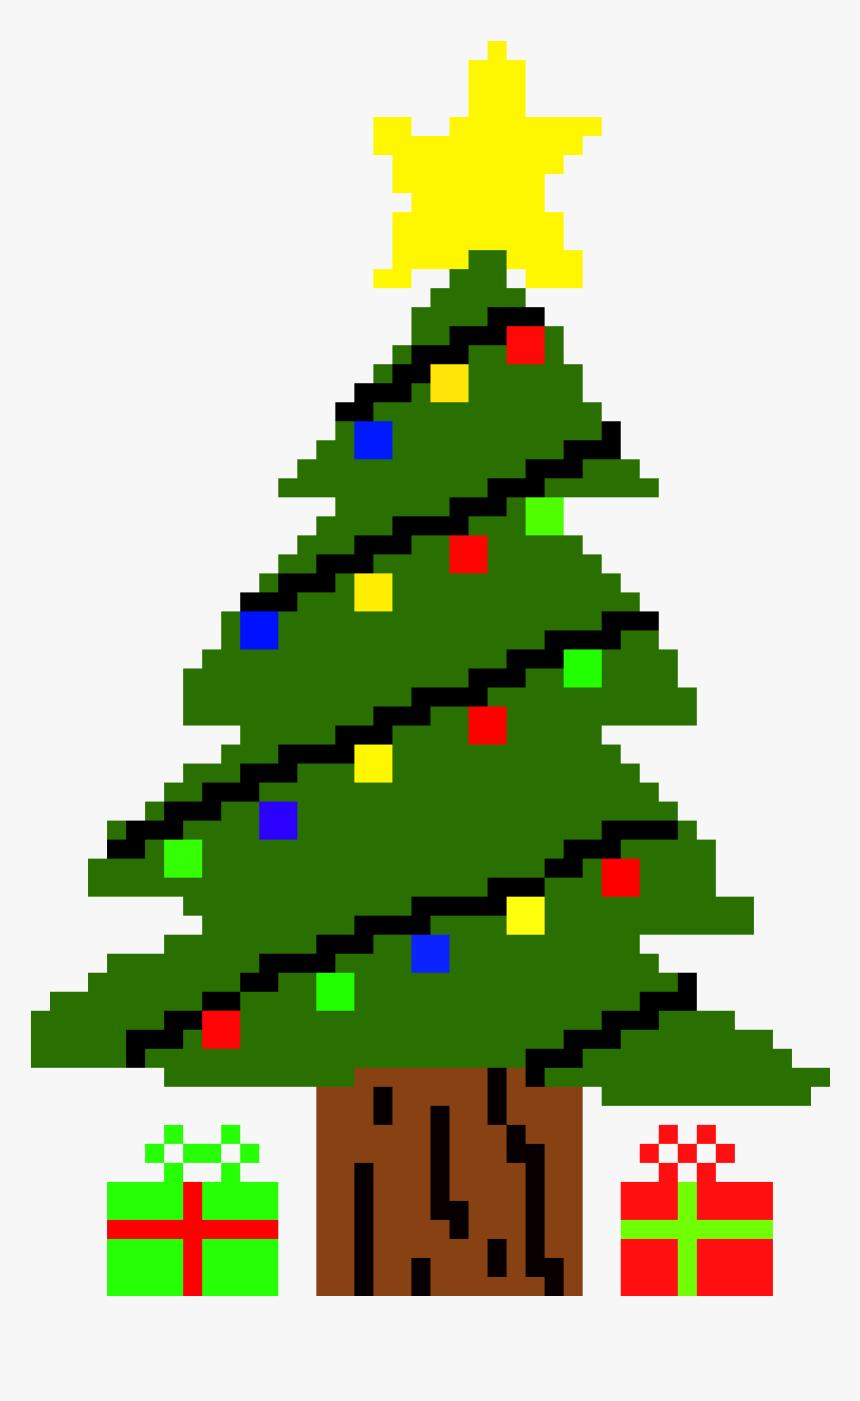 Christmas Tree Pixel Art Png, Transparent Png , Transparent tout Pixel Art De Noël